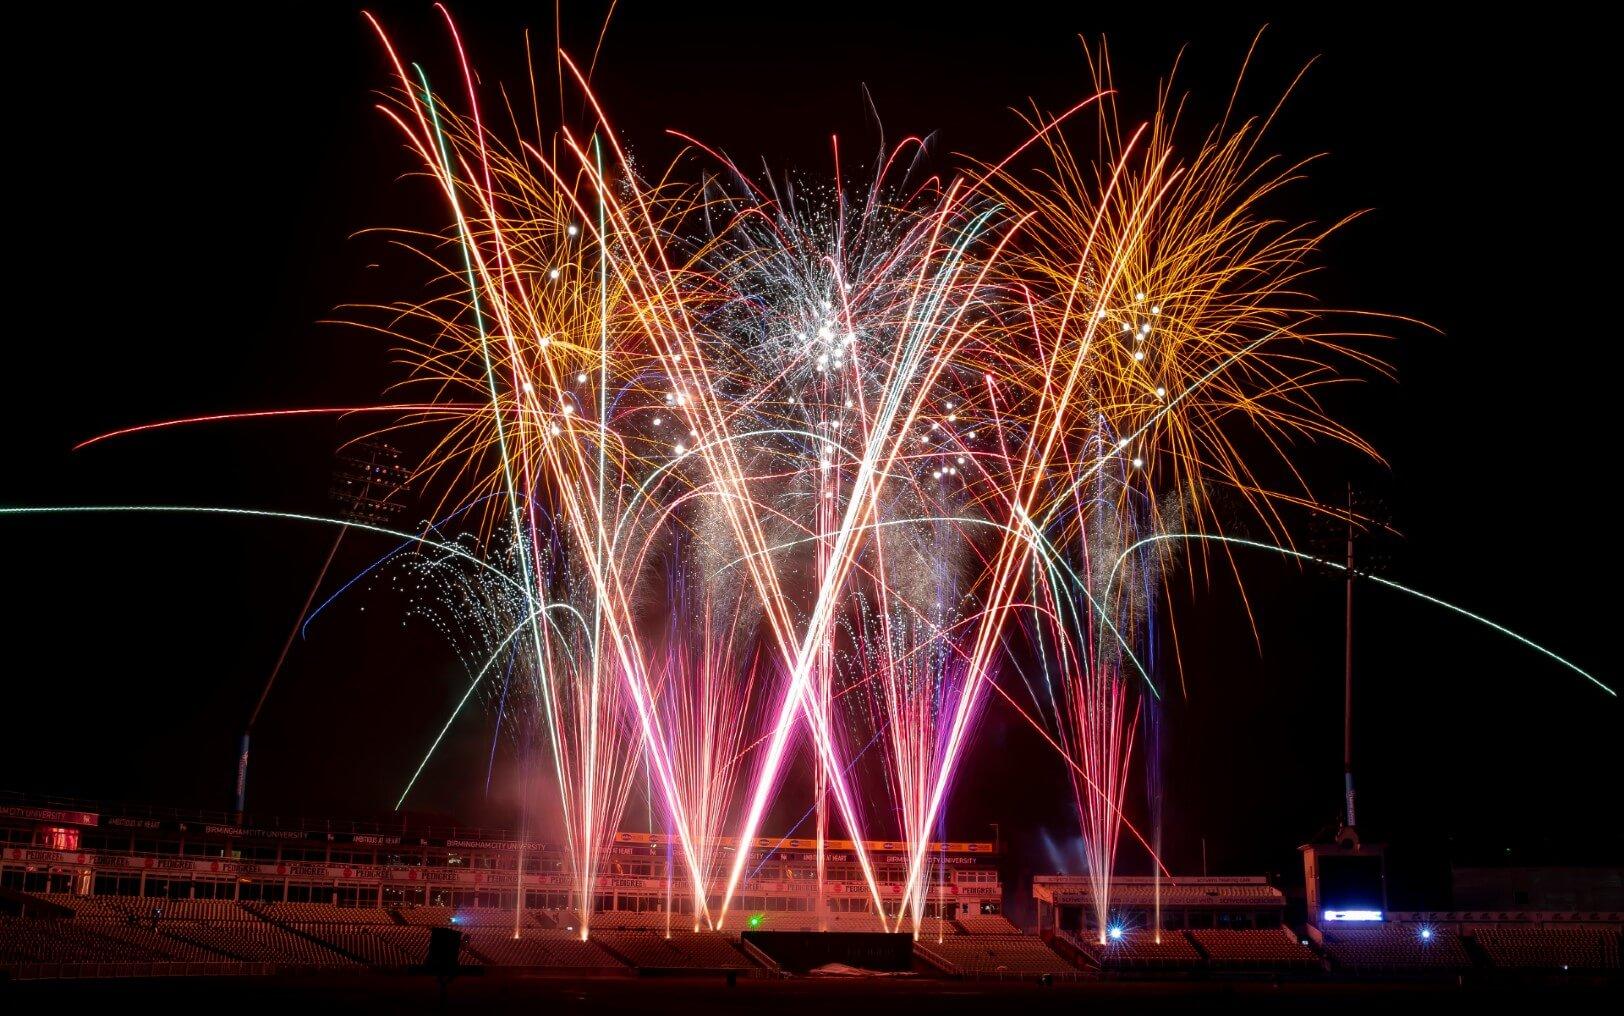 Edgbaston confirm return of Fireworks Spectacular & Fun Fair for 2021